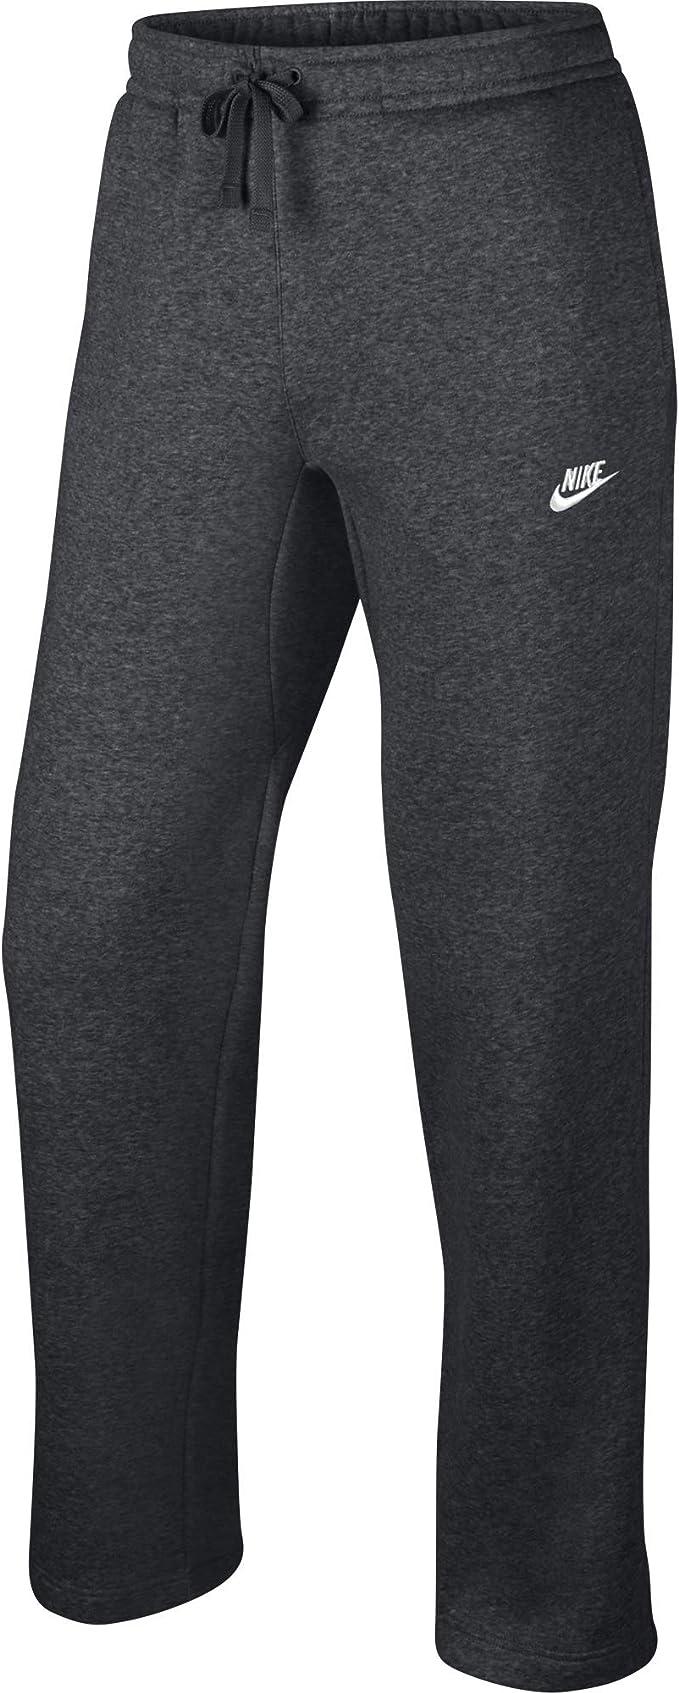 Nike Men's Sportswear Open Hem Club Pants, Charcoal Heather/White,  XXX-Large Tall